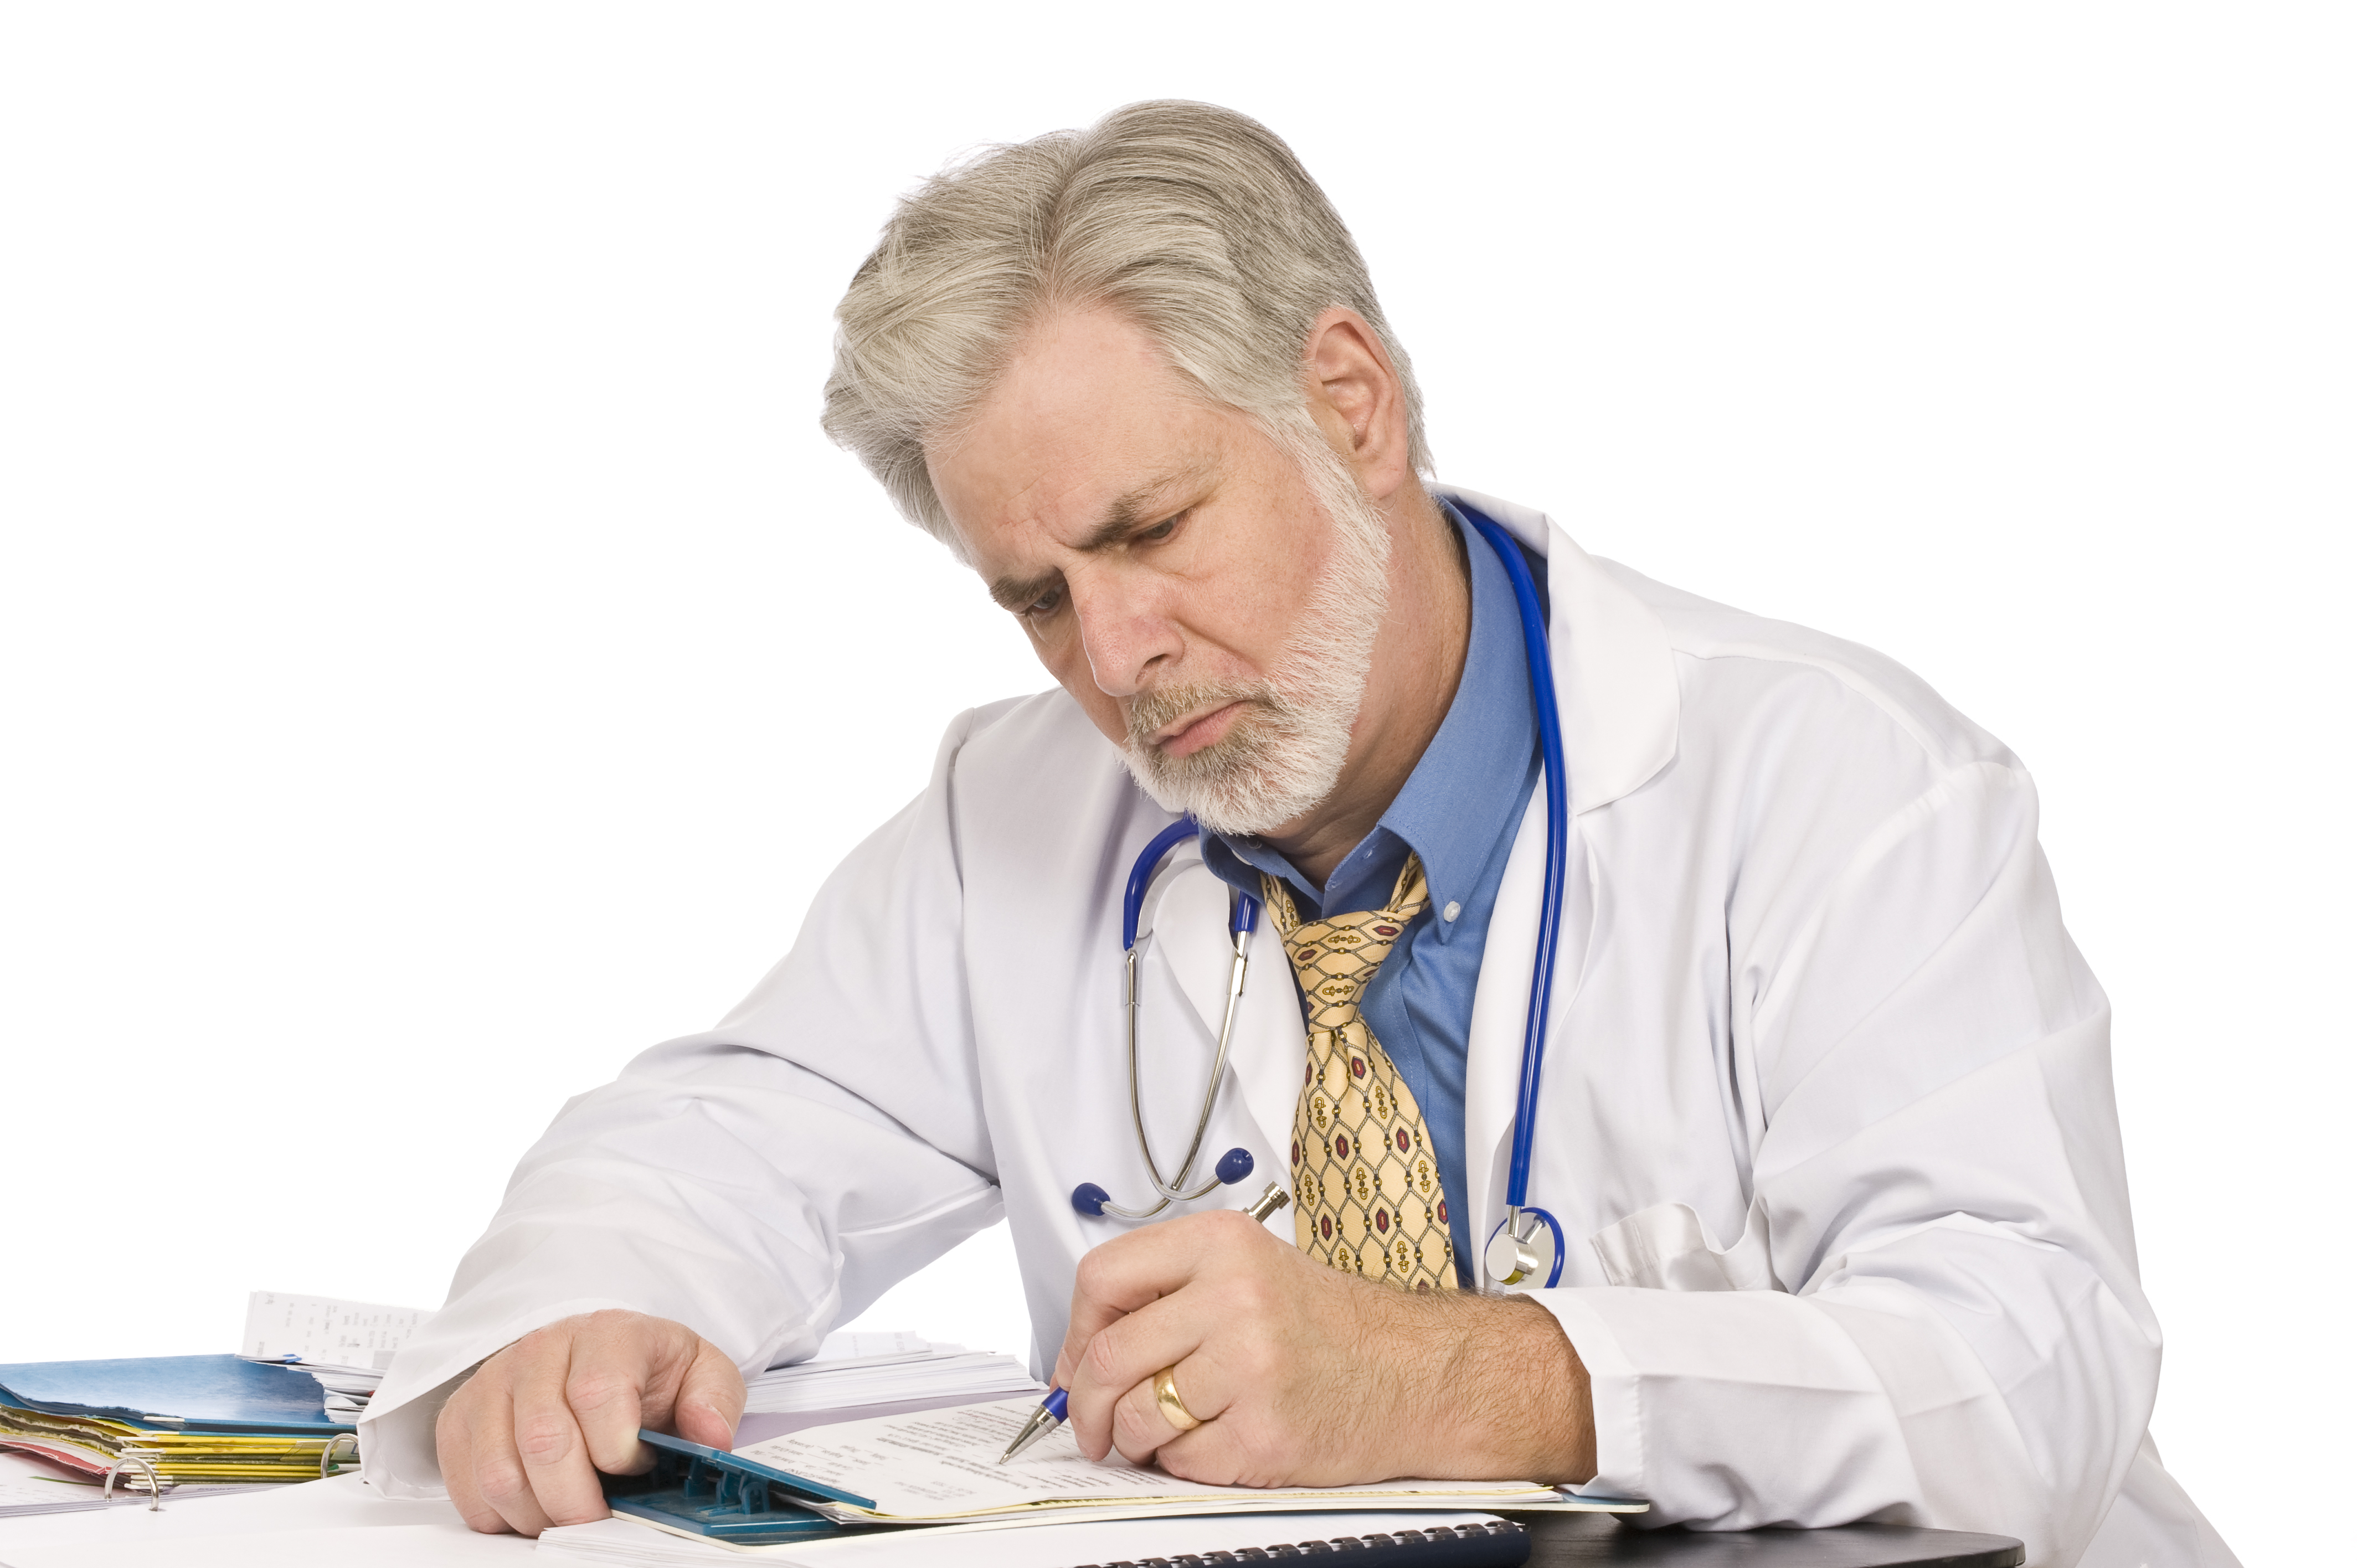 Doctor Completing Paperwork